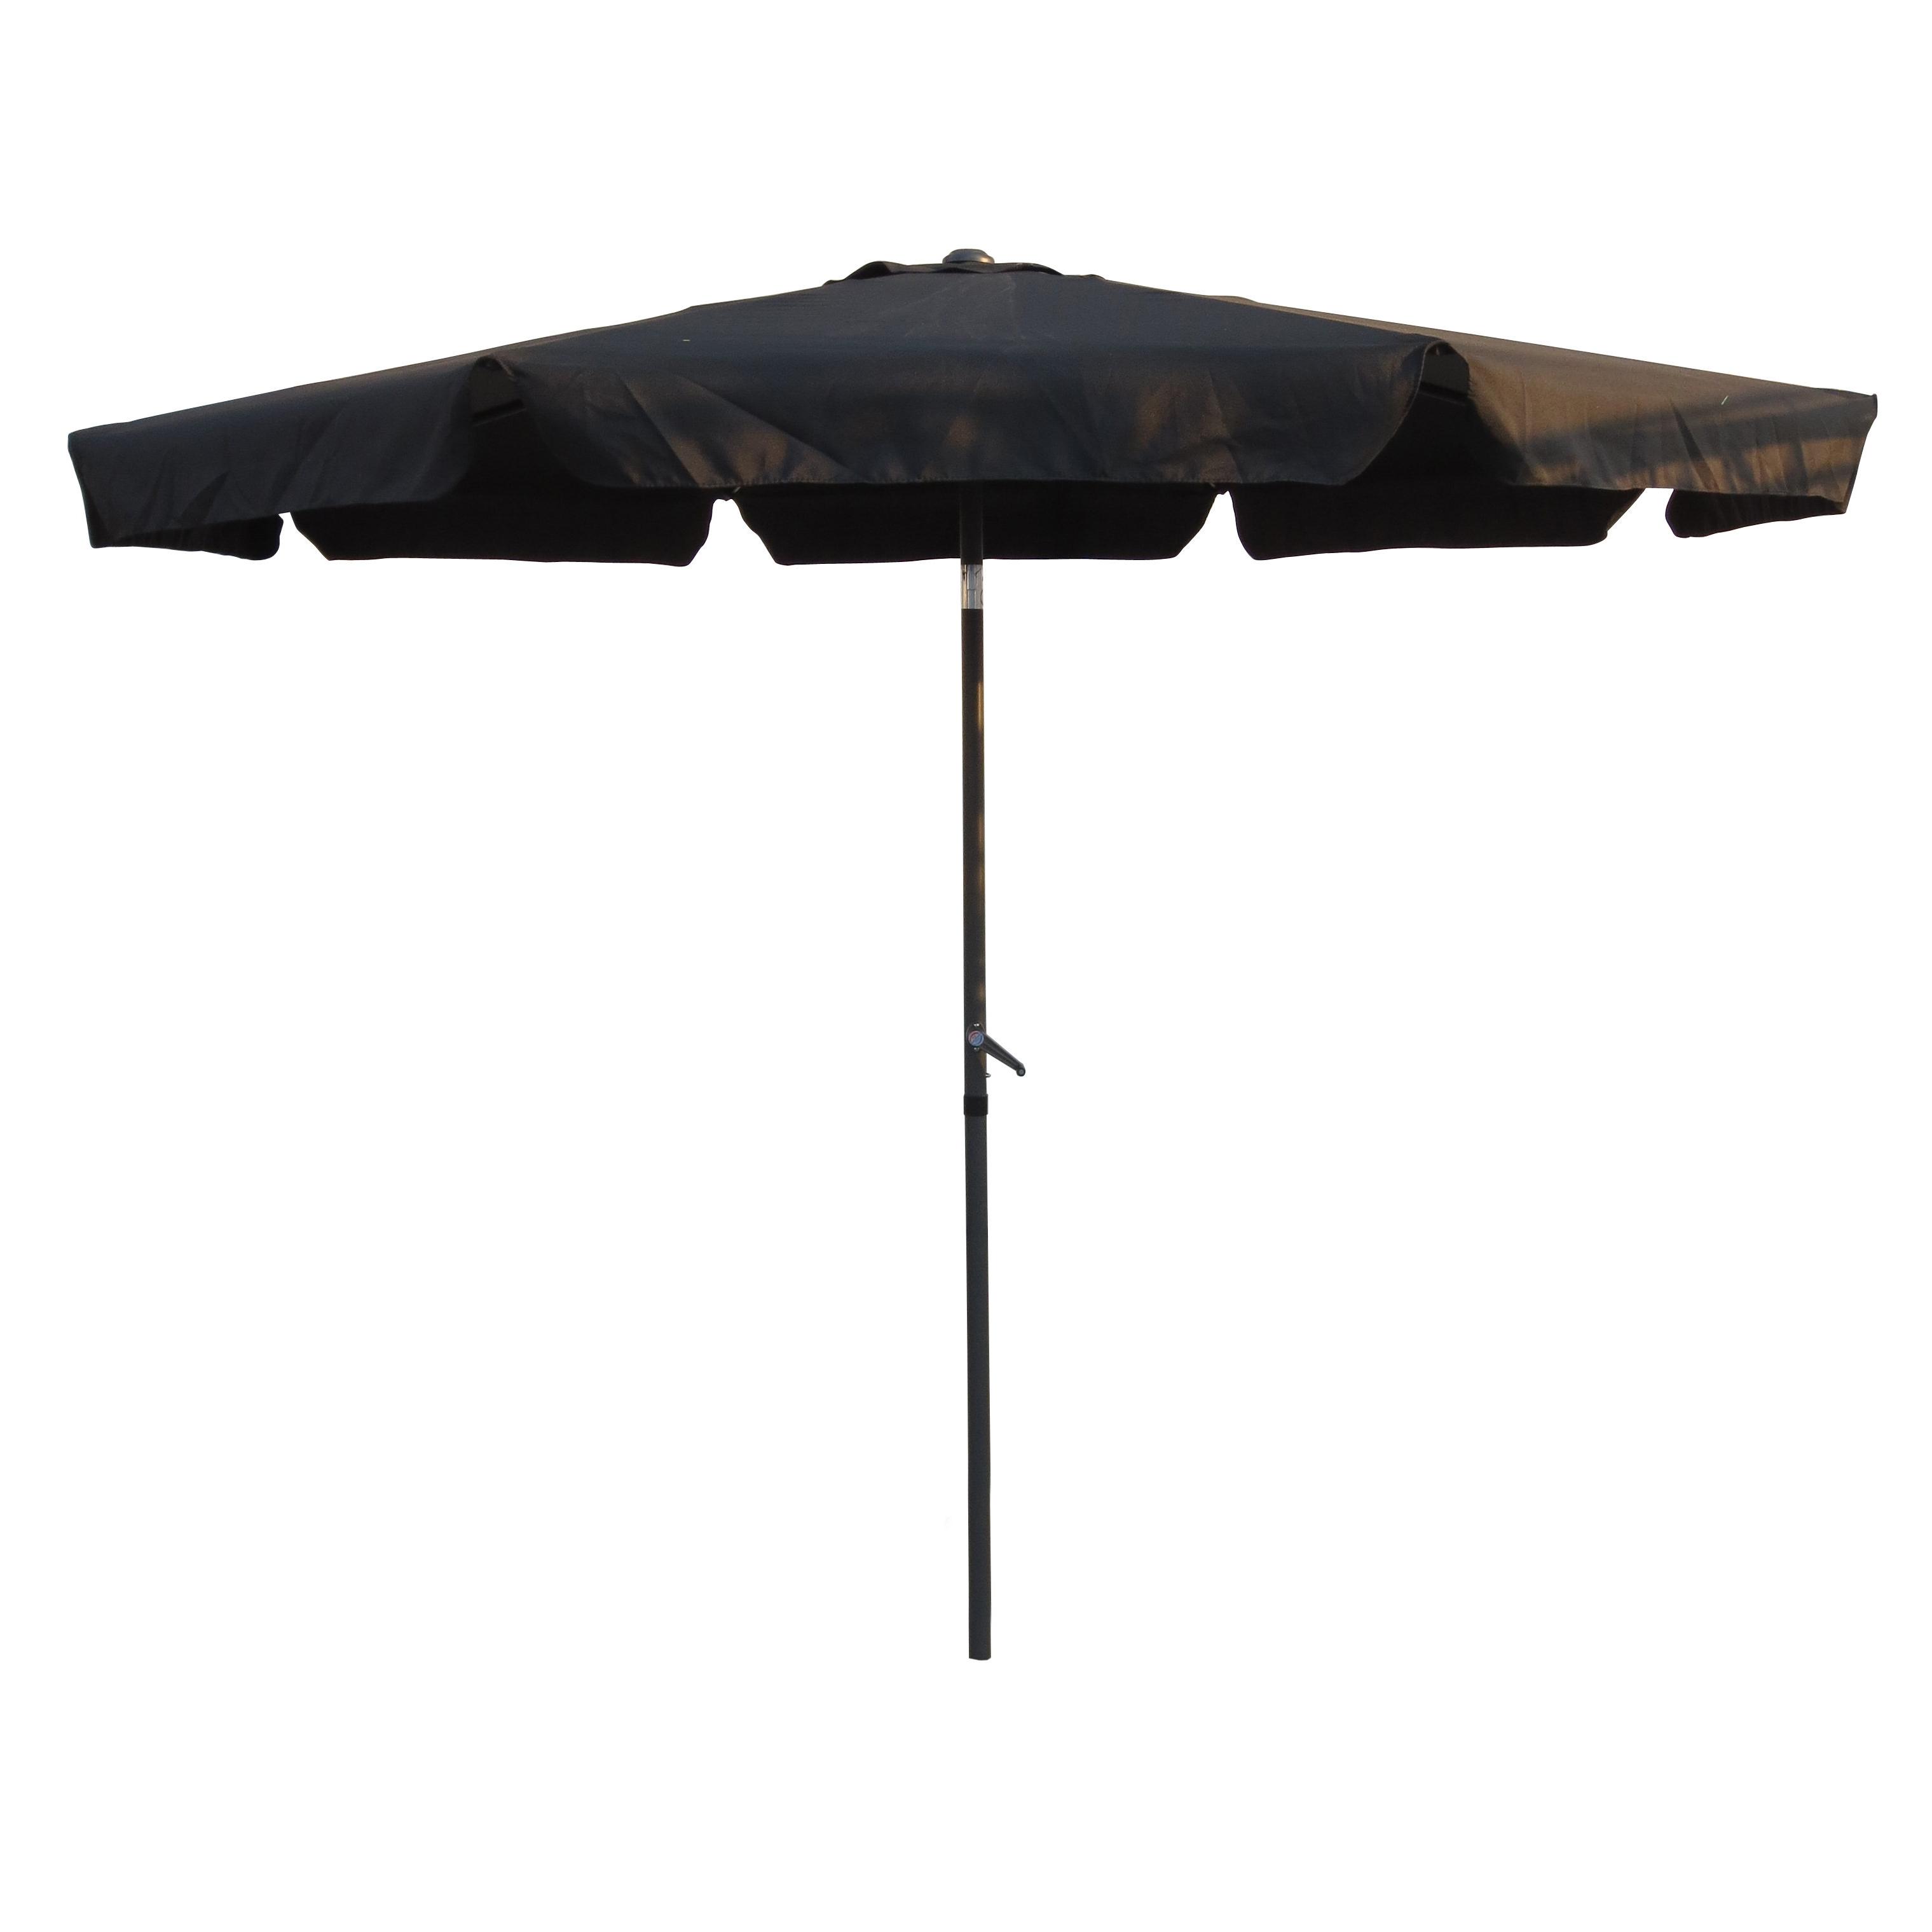 2019 Devansh Market Umbrellas In Wrought Studio Devansh 10' Drape Umbrella (View 1 of 20)